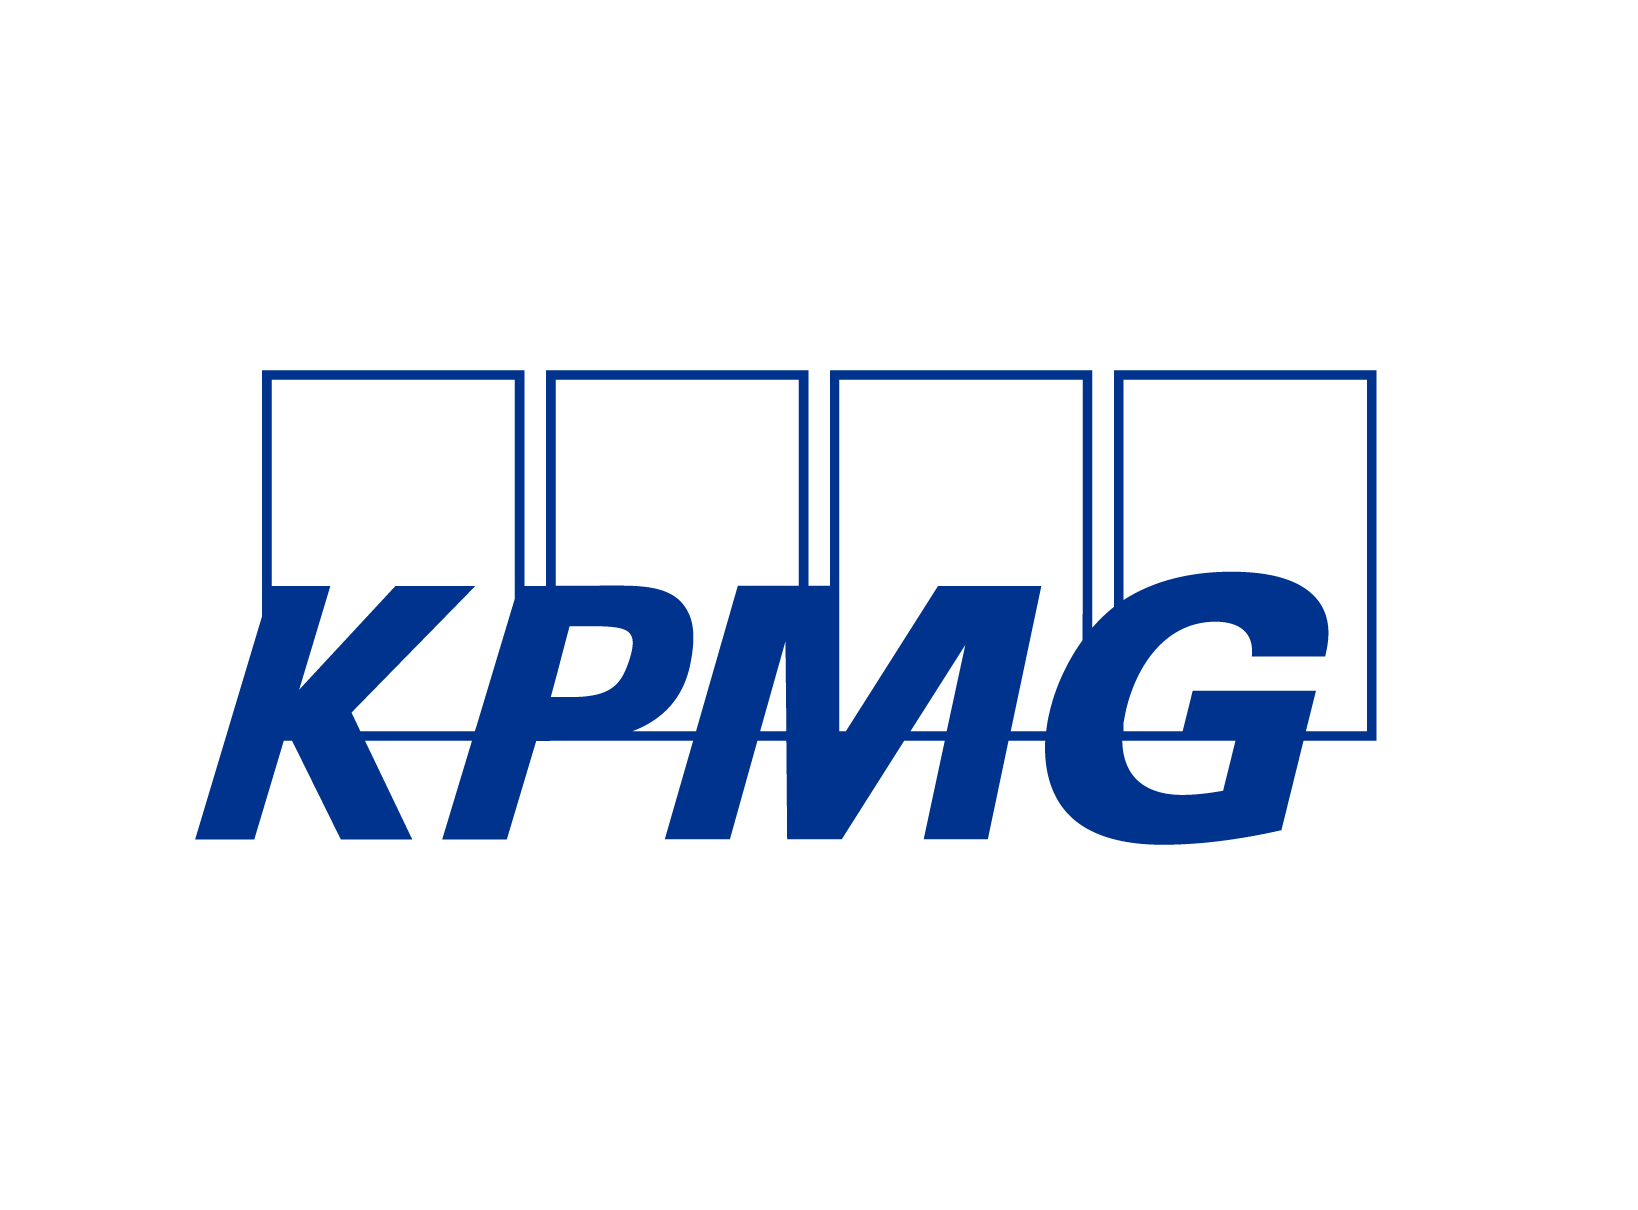 kpmg_nocp_rgb.jpg